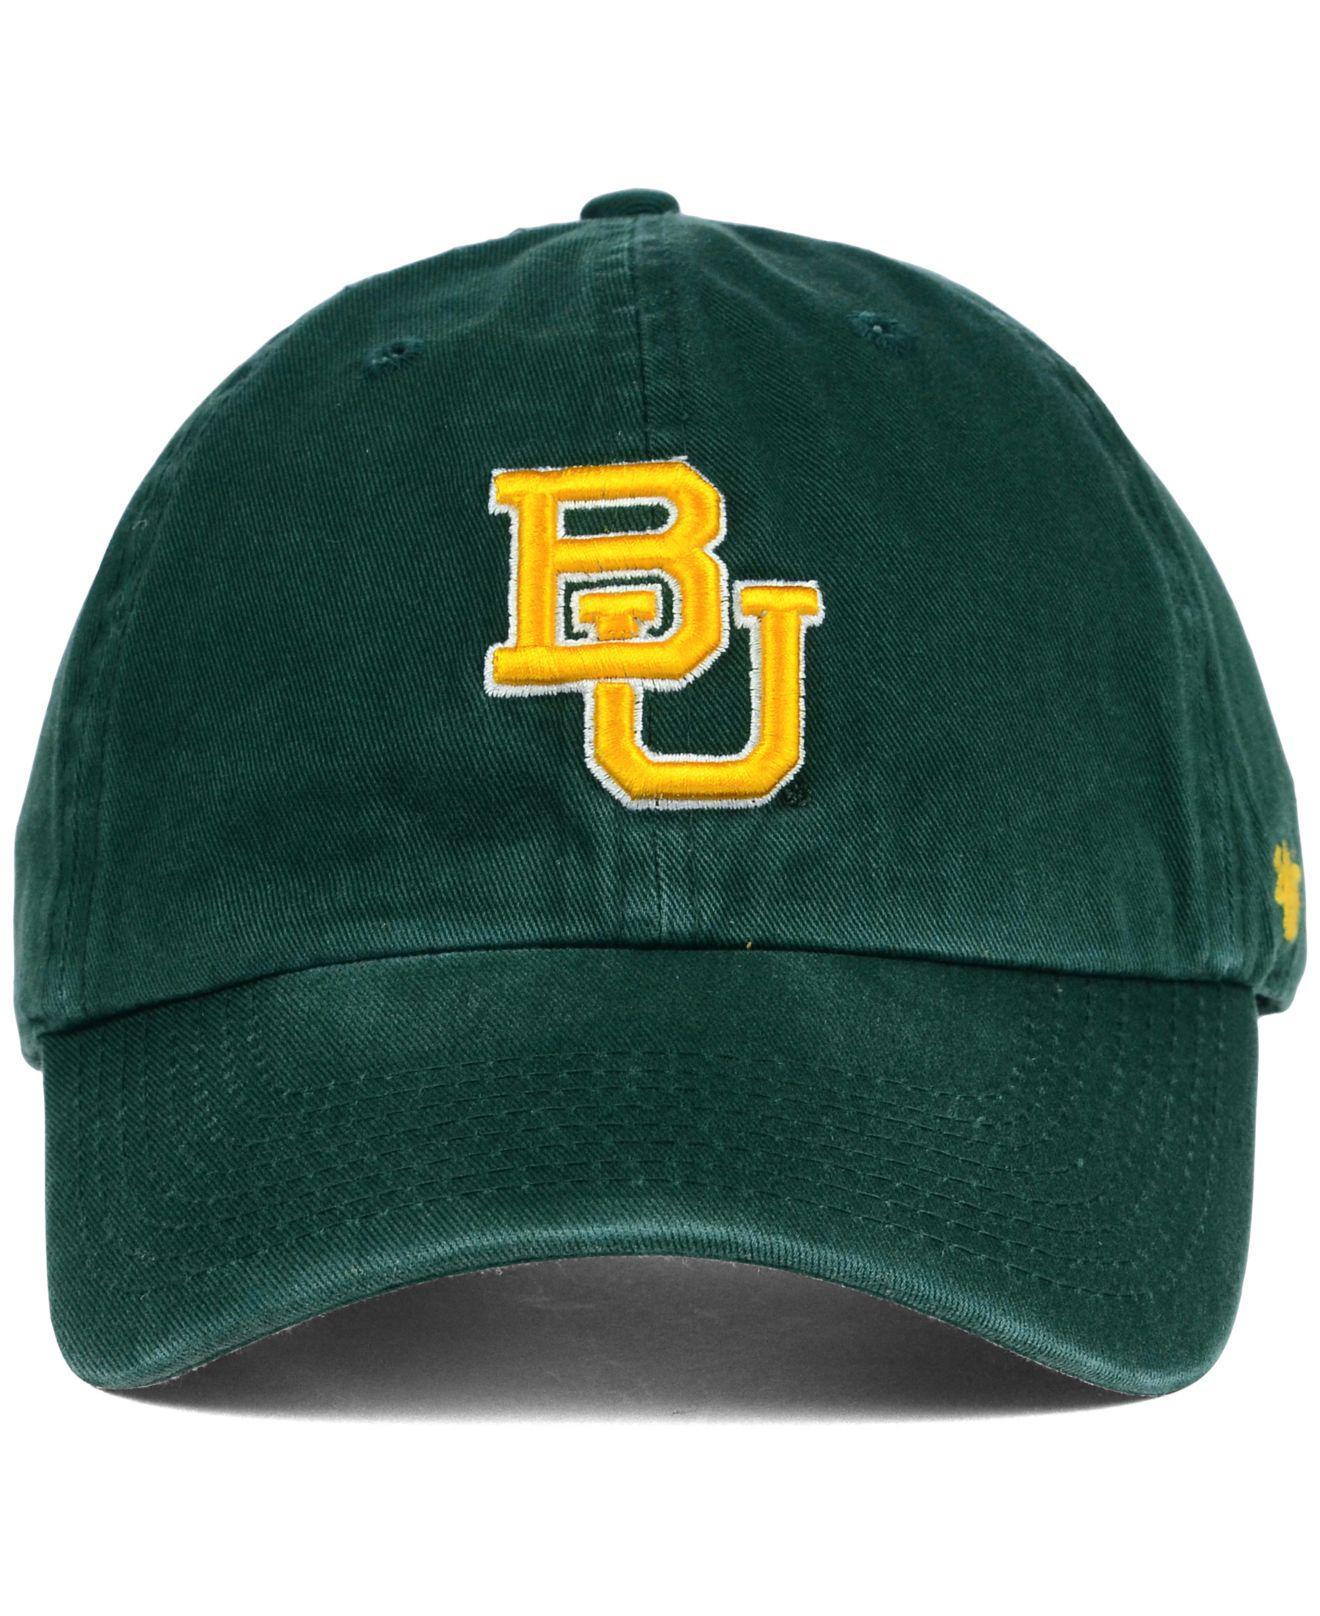 ... franchise green strap back hat cap 47 brand big 12 sic em bears 17608  752b5  best lyst 47 brand baylor bears clean up cap in green for men 42946  952f0 38620c2f8